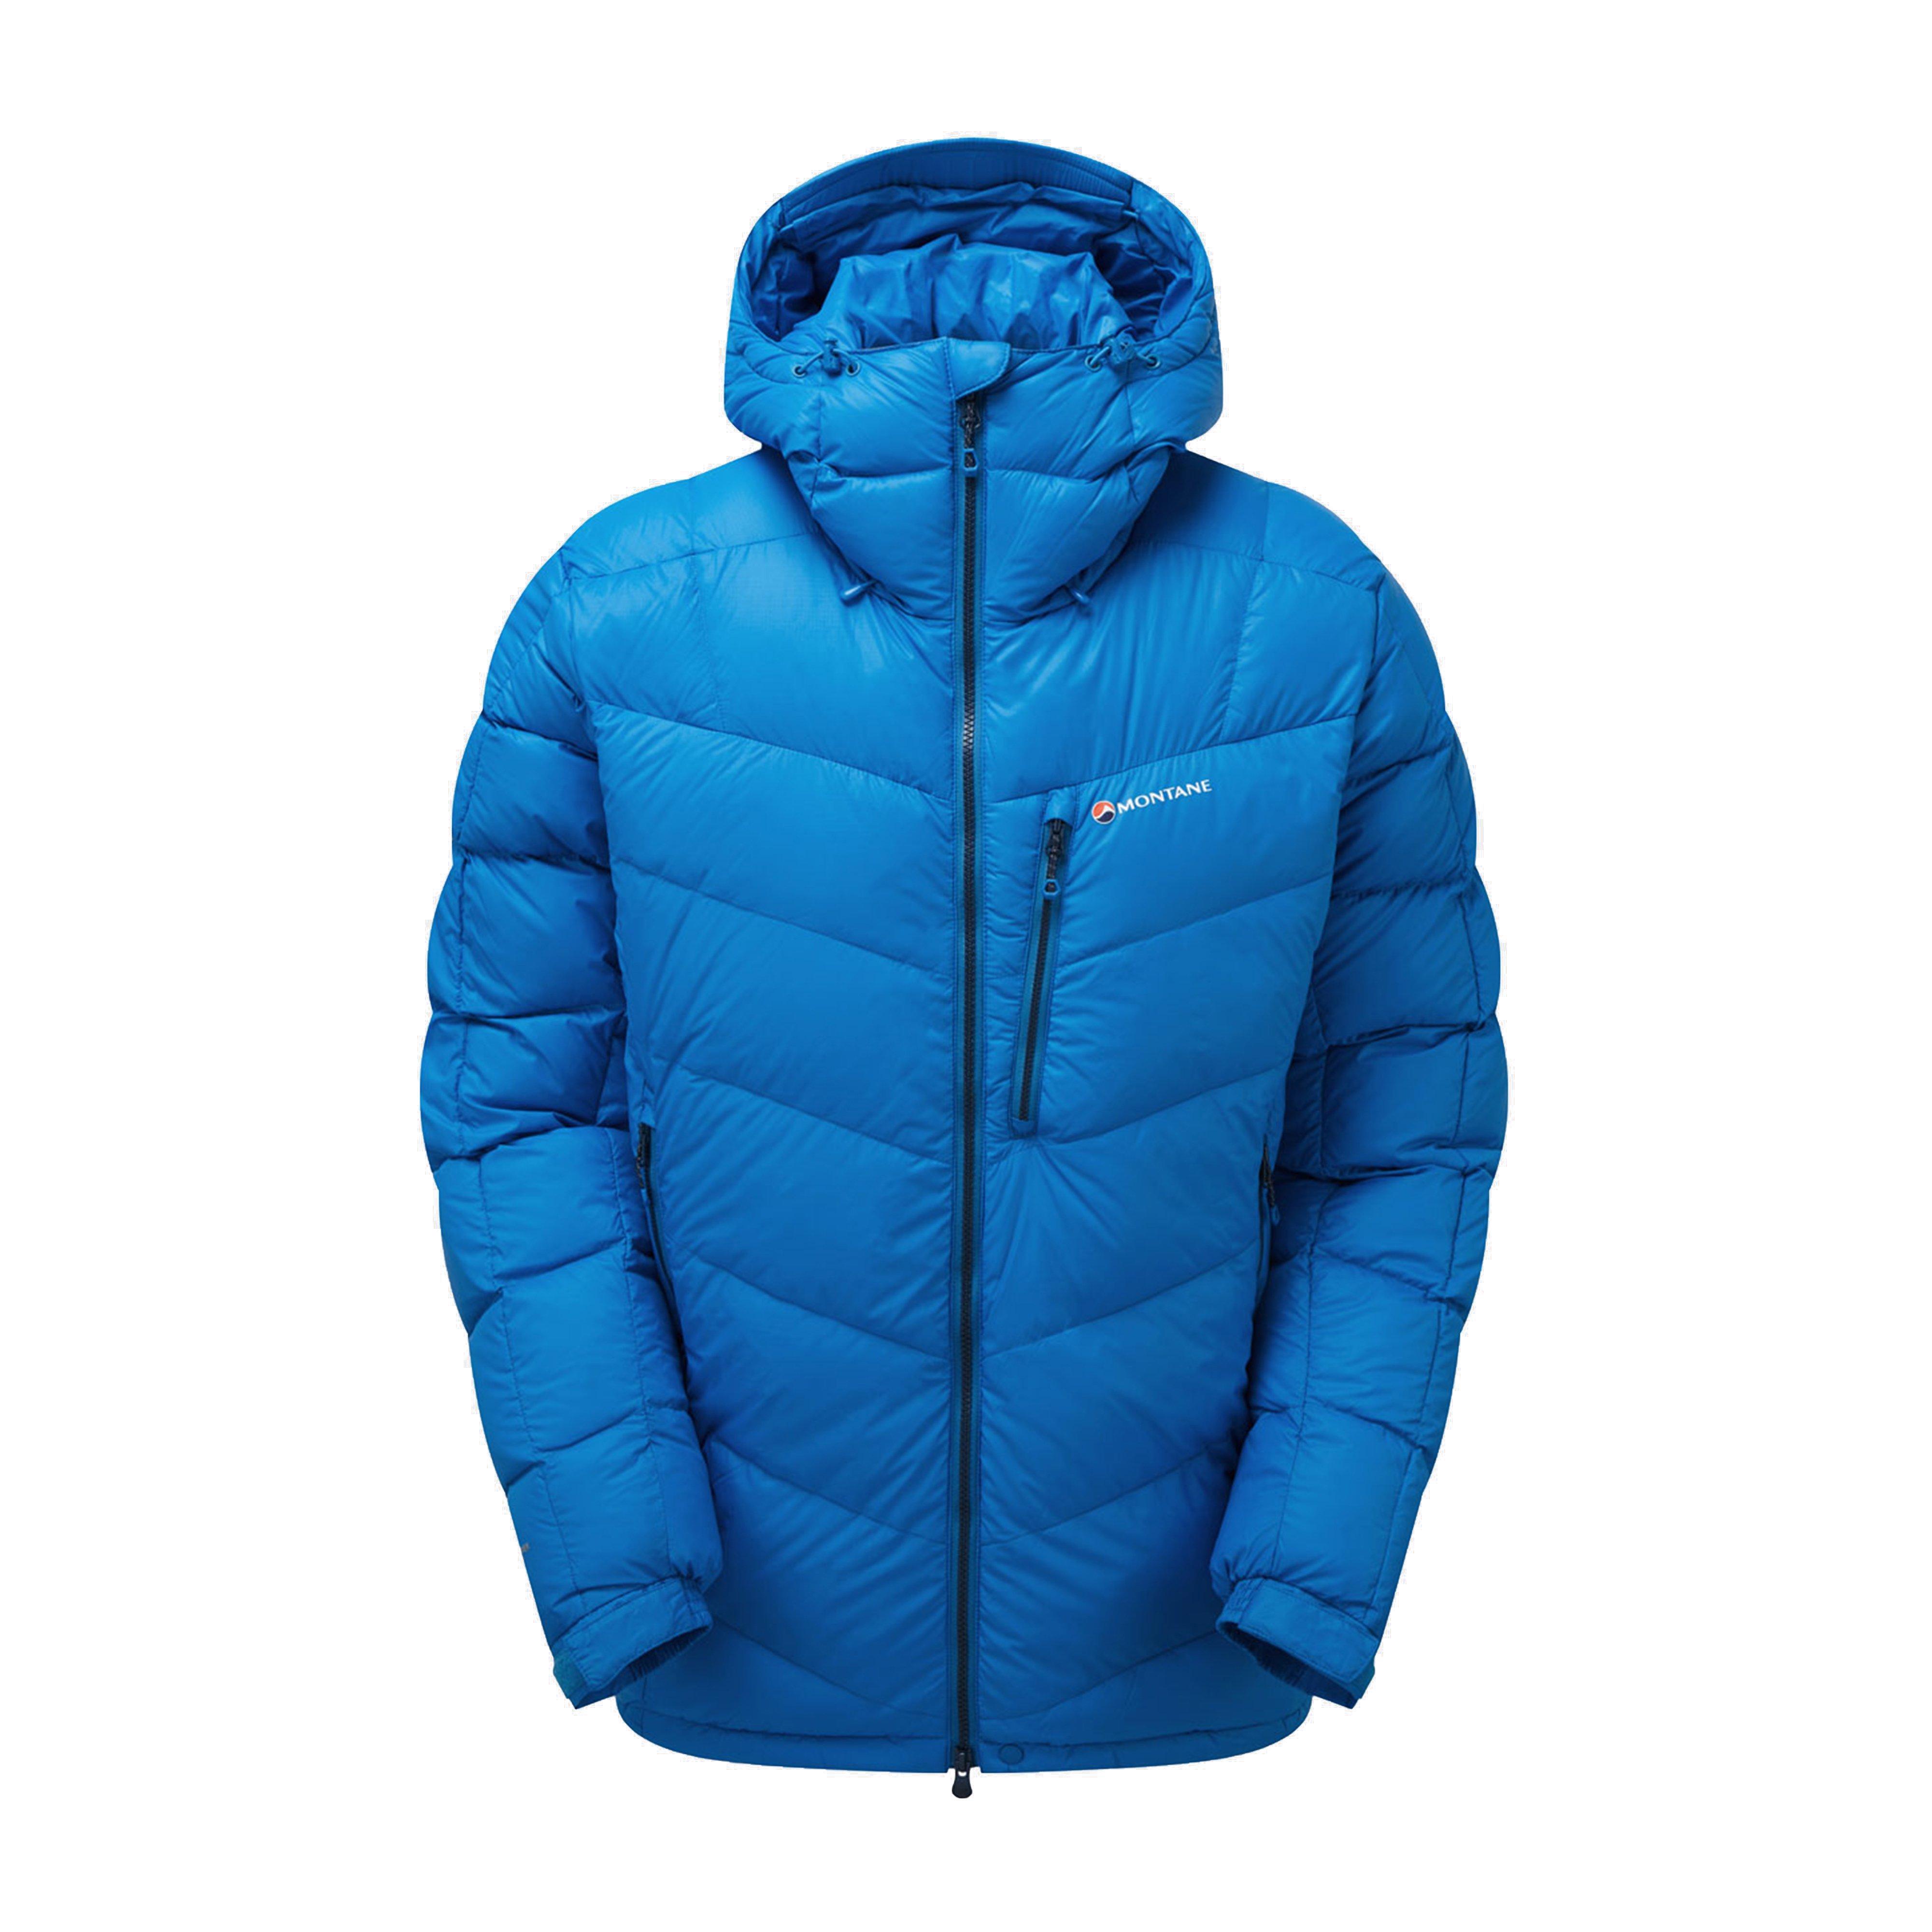 Montane Montane Mens Jagged Ice Jacket, Blue